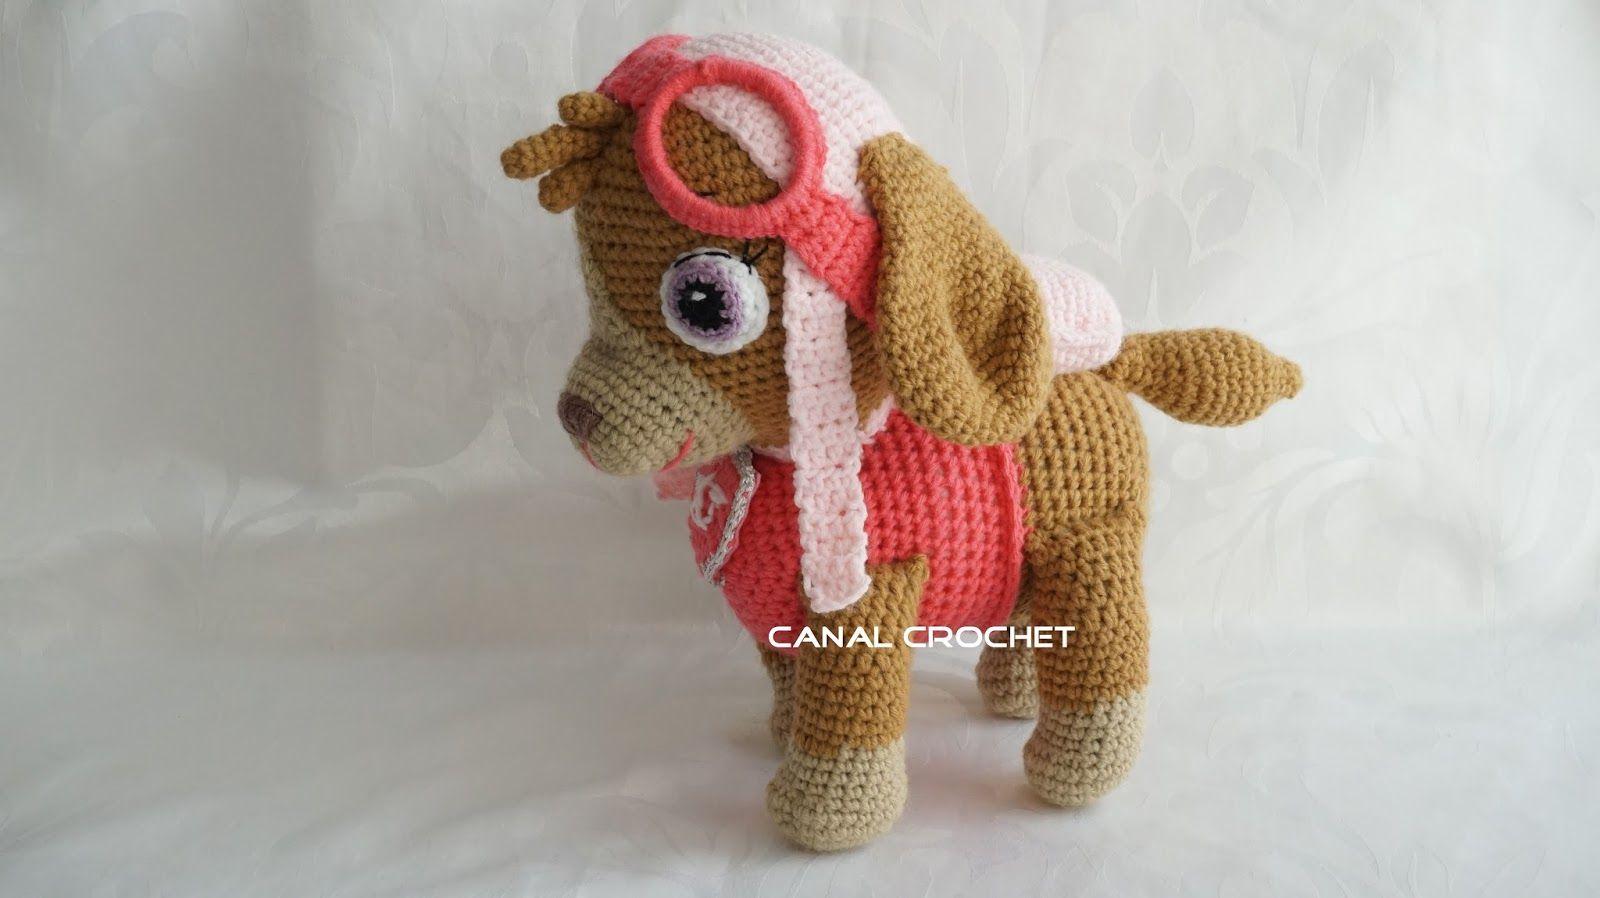 Tutorial Amigurumi : Canal crochet patrulla canina amigurumi tutorial nit